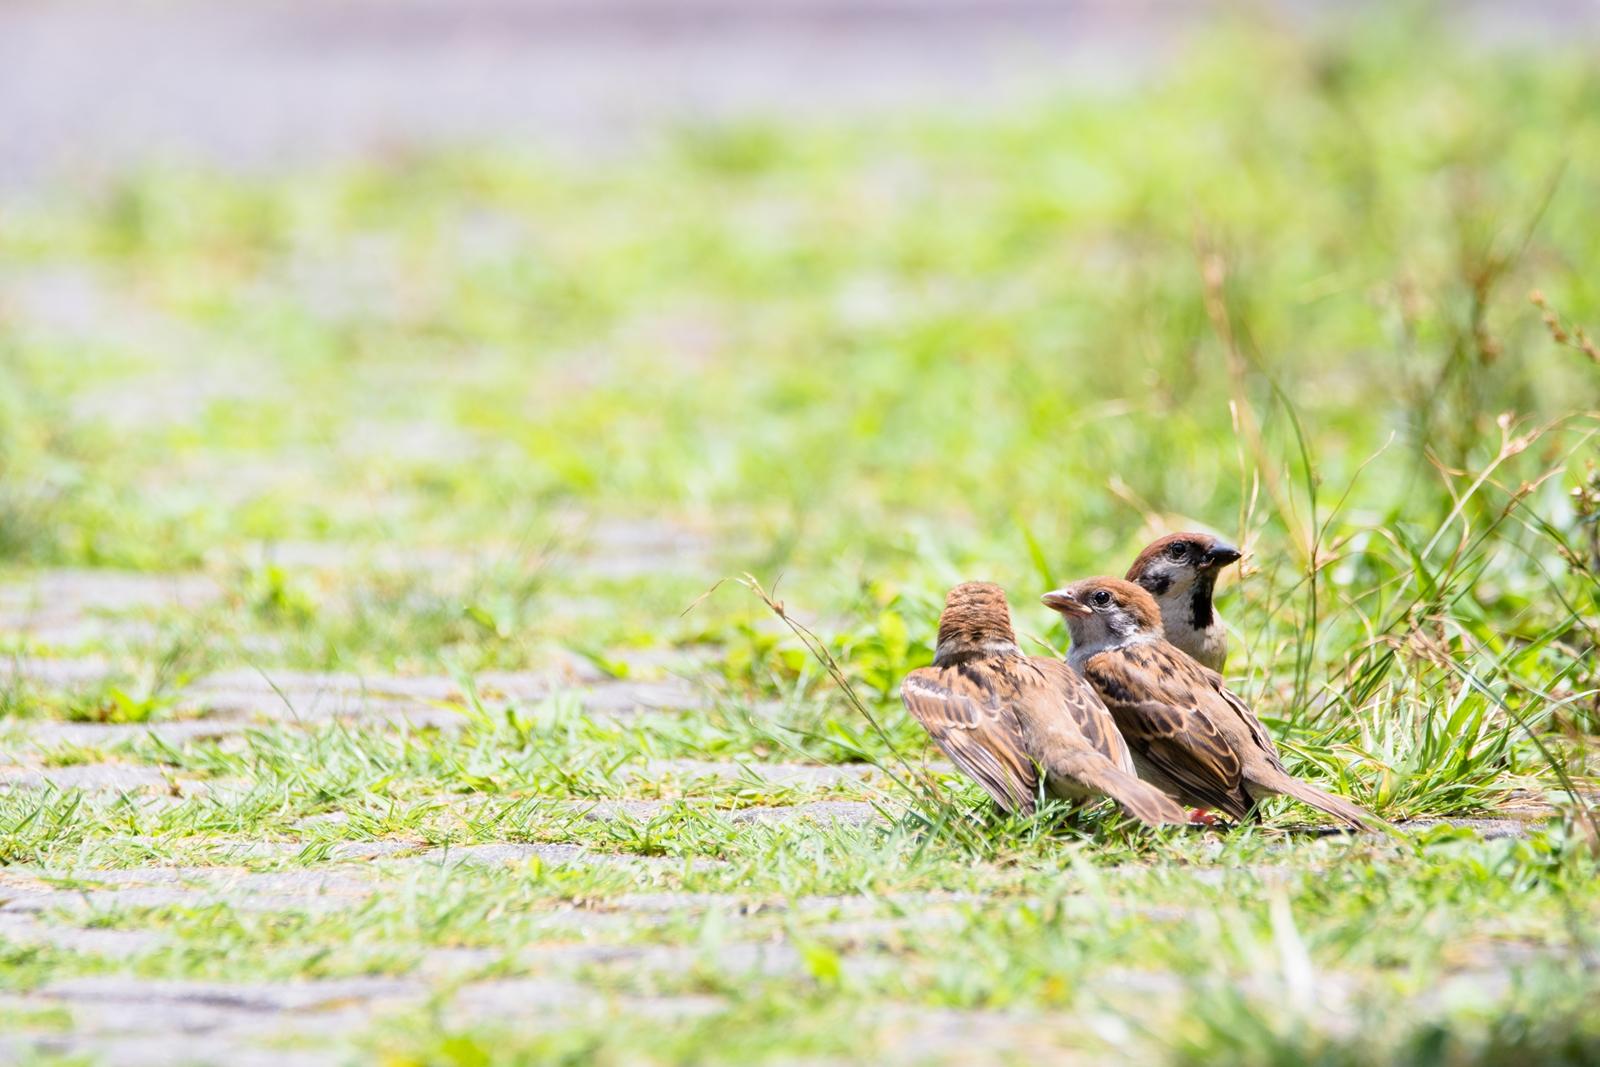 Photo: 「社会科見学」 / Social studies field trip.  あれはなに? これはなんだろう? 質問の飛び交う社会科見学 人の世界は疑問がいっぱい  Sparrow. (スズメ)  Nikon D500 SIGMA 150-600mm F5-6.3 DG OS HSM Contemporary  #birdphotography #birds #kawaii #ことり #小鳥 #nikon #sigma  ( http://takafumiooshio.com/archives/2755 )